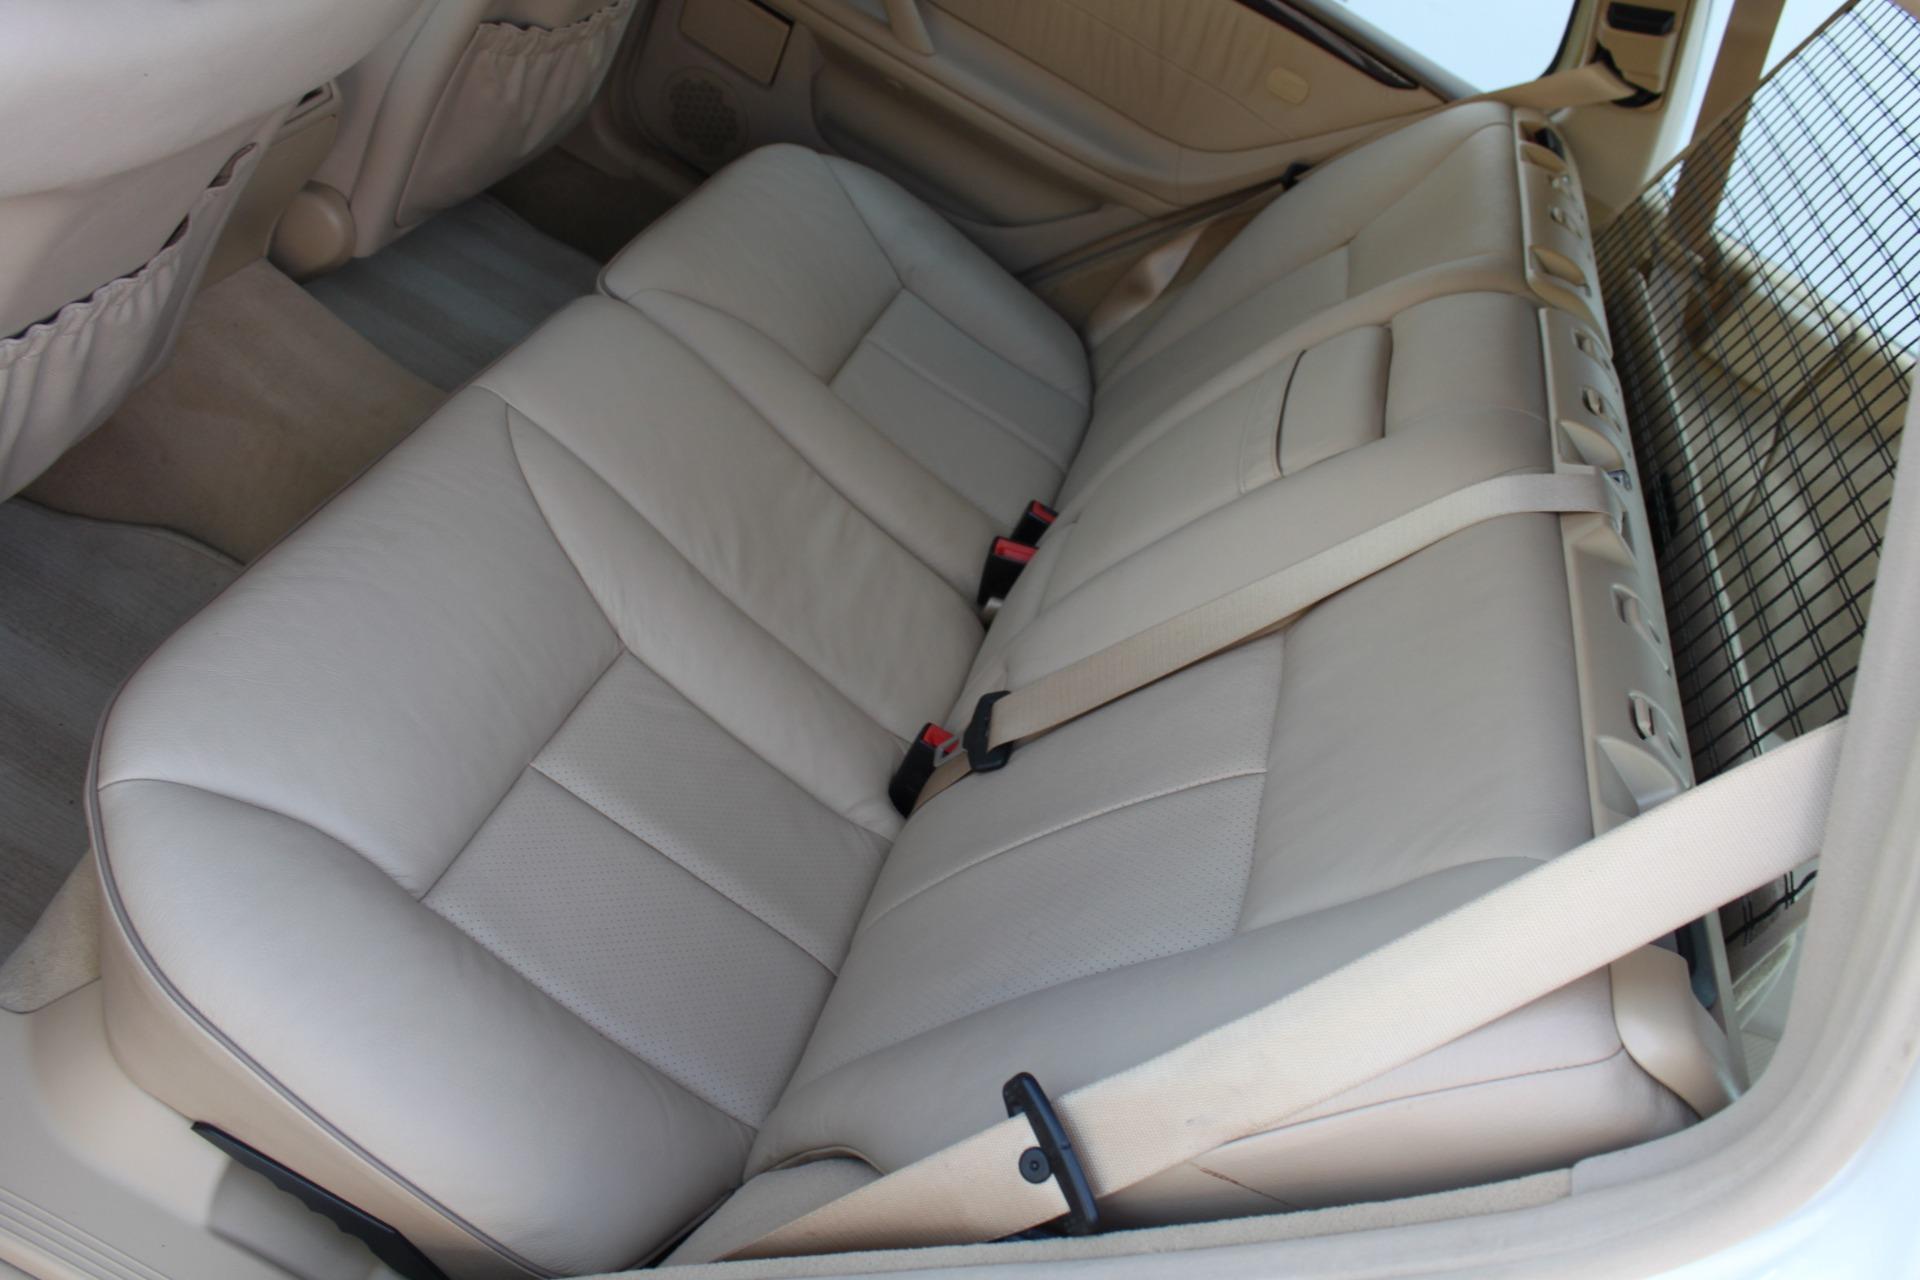 Used-2000-Mercedes-Benz-E-Class-Wagon-Acura